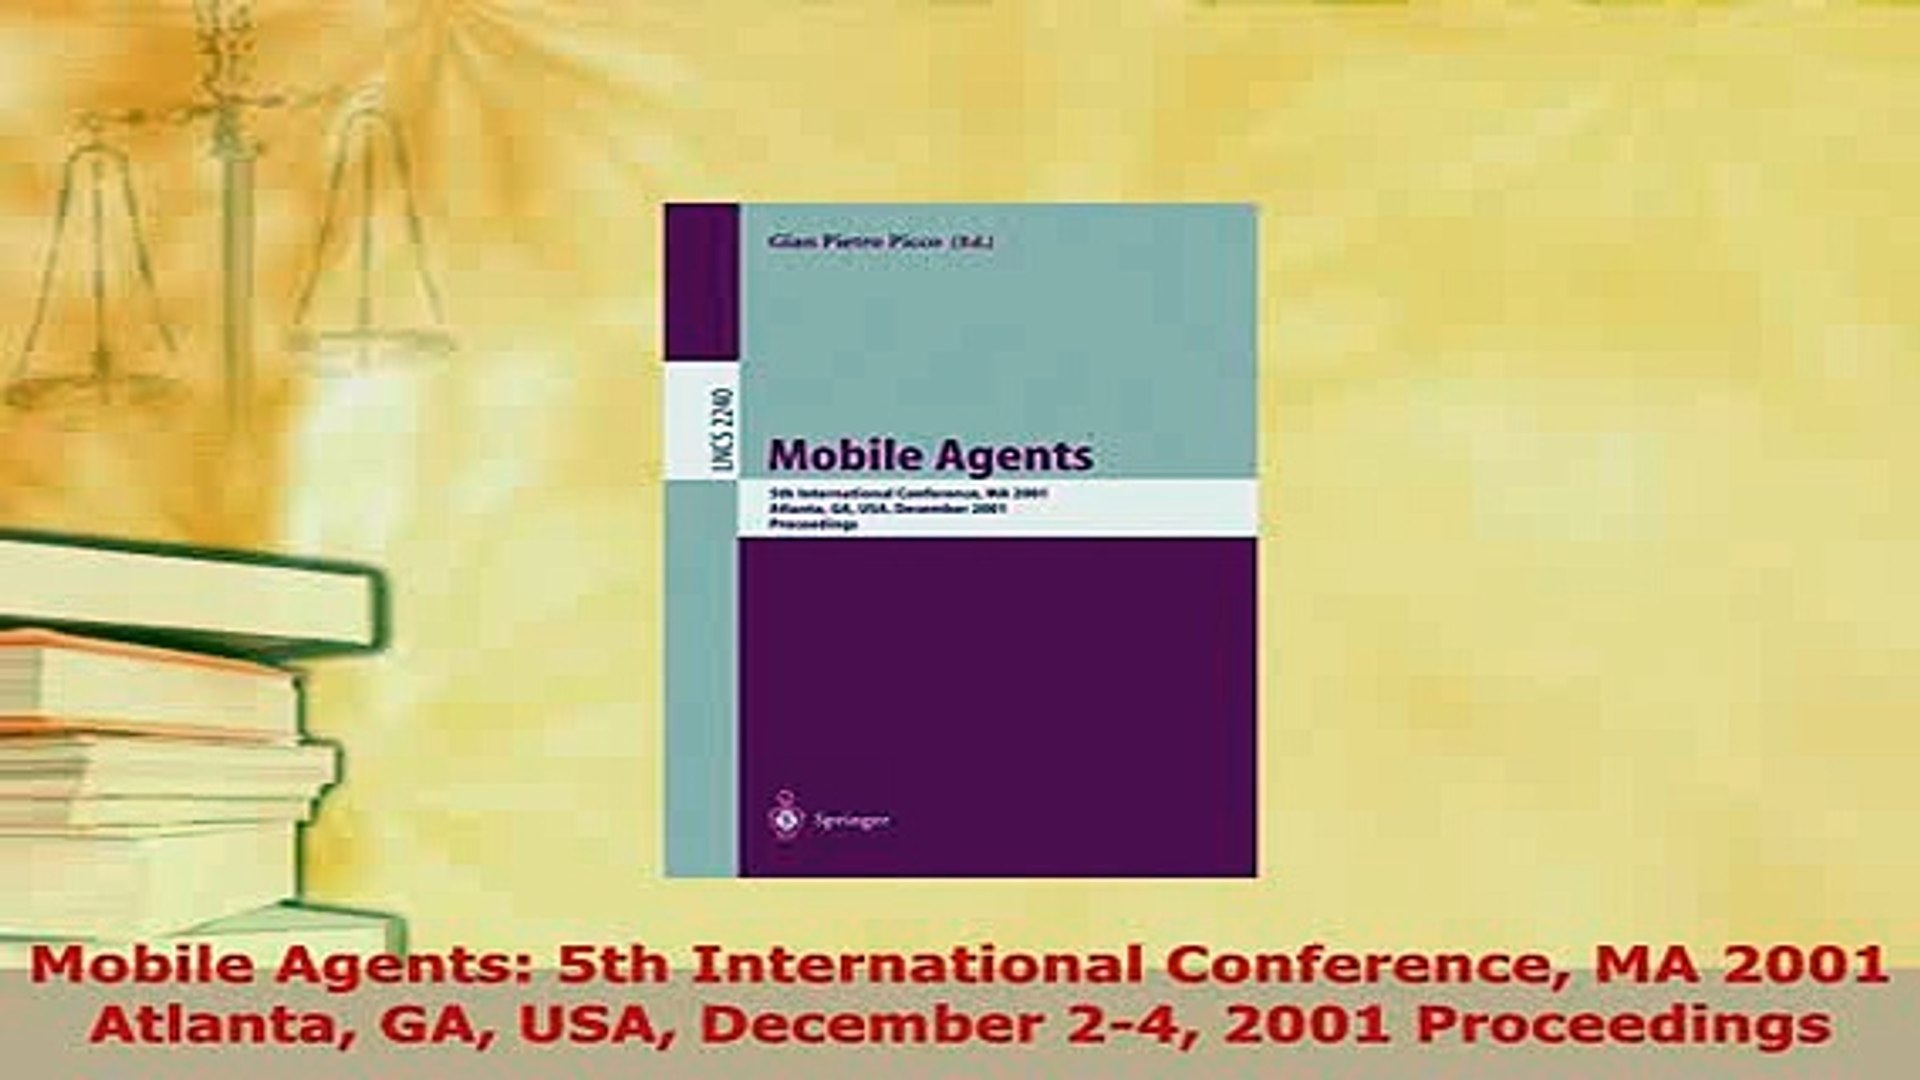 Download  Mobile Agents 5th International Conference MA 2001 Atlanta GA USA December 24 2001  EBook